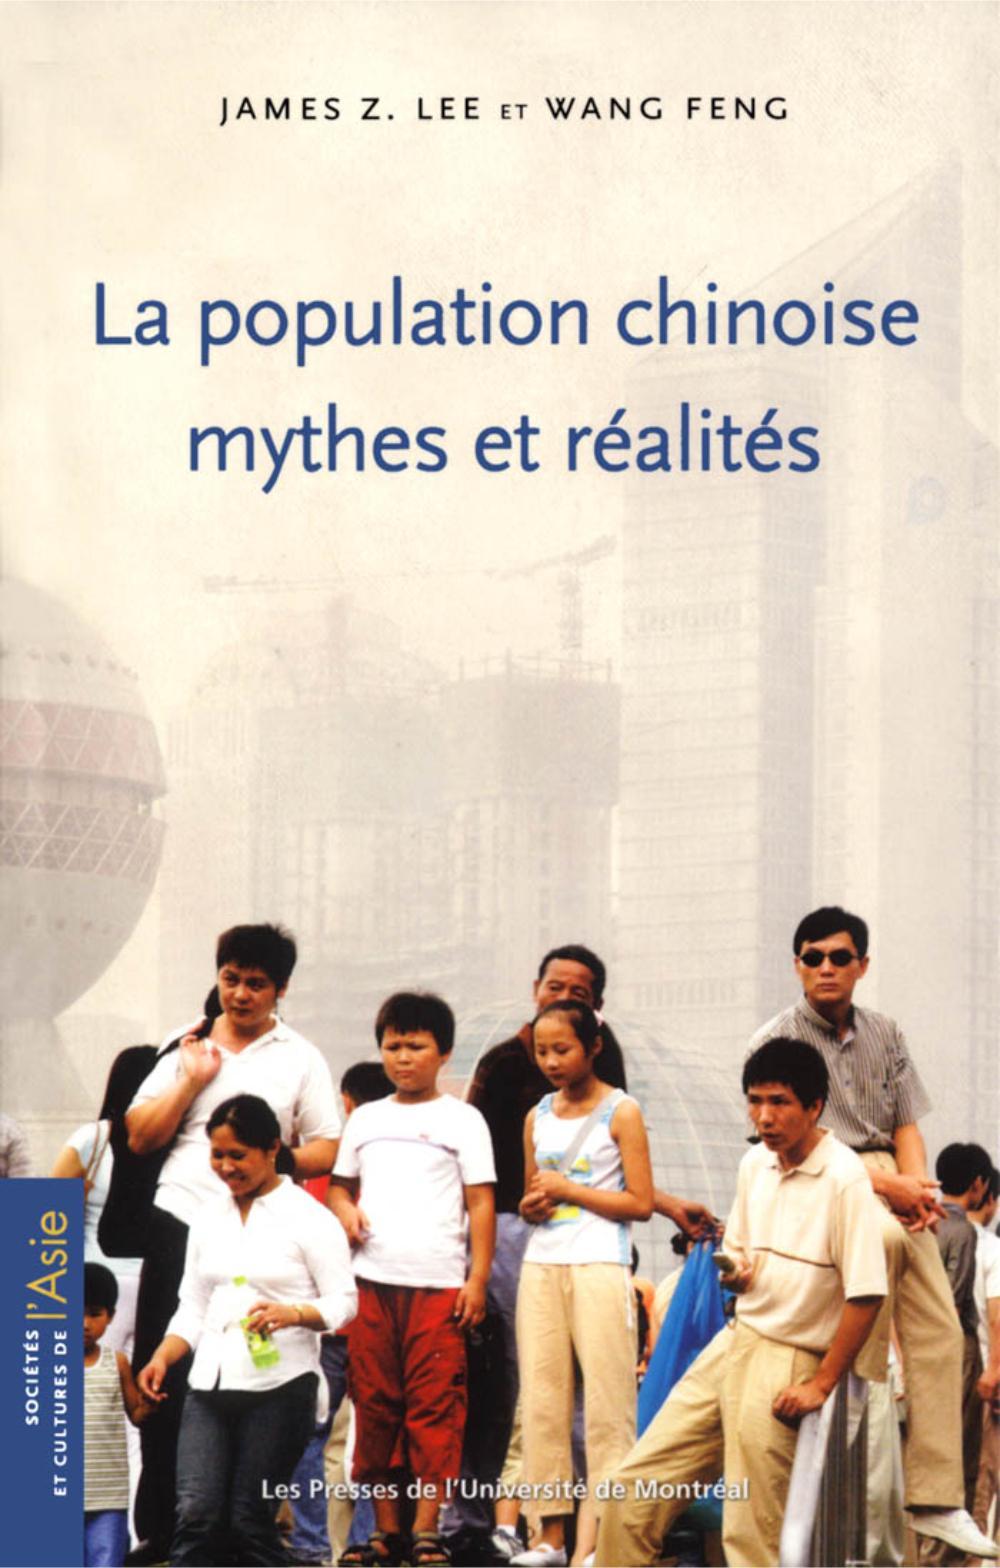 LA POPULATION CHINOISE: MYTHES ET REALITES